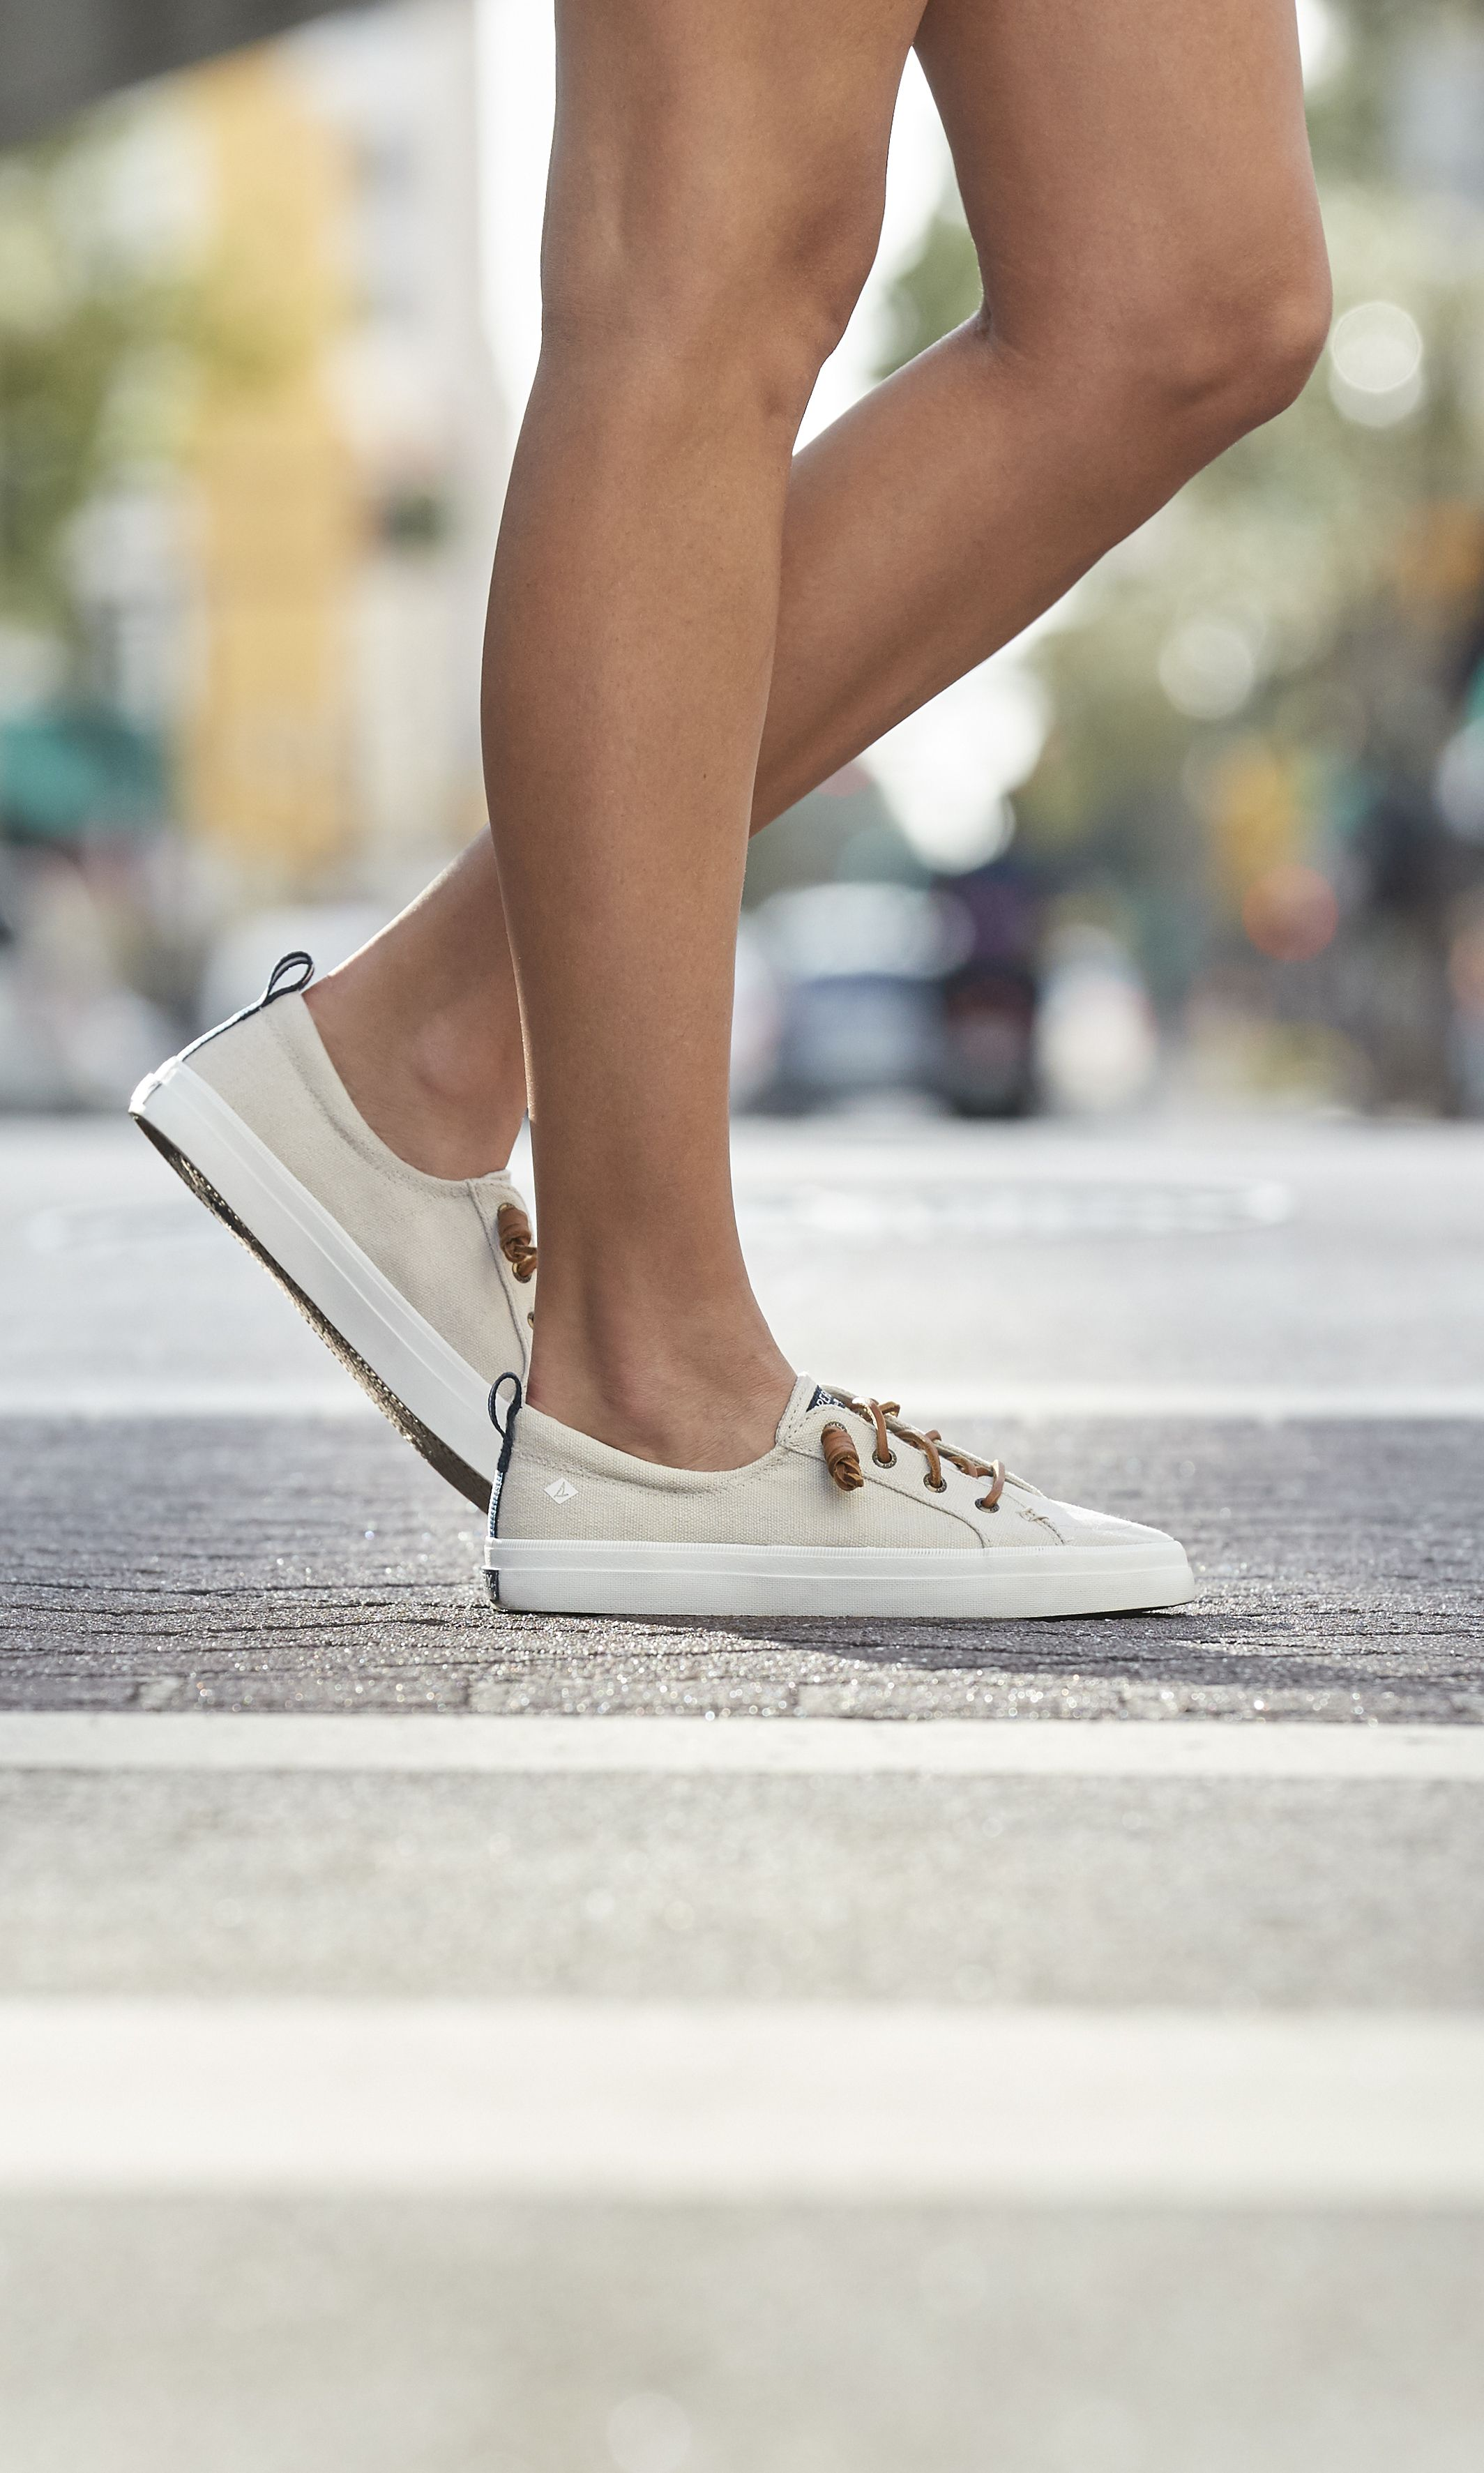 Sperry Top-Sider Womens Crest Vibe Linen Sneaker